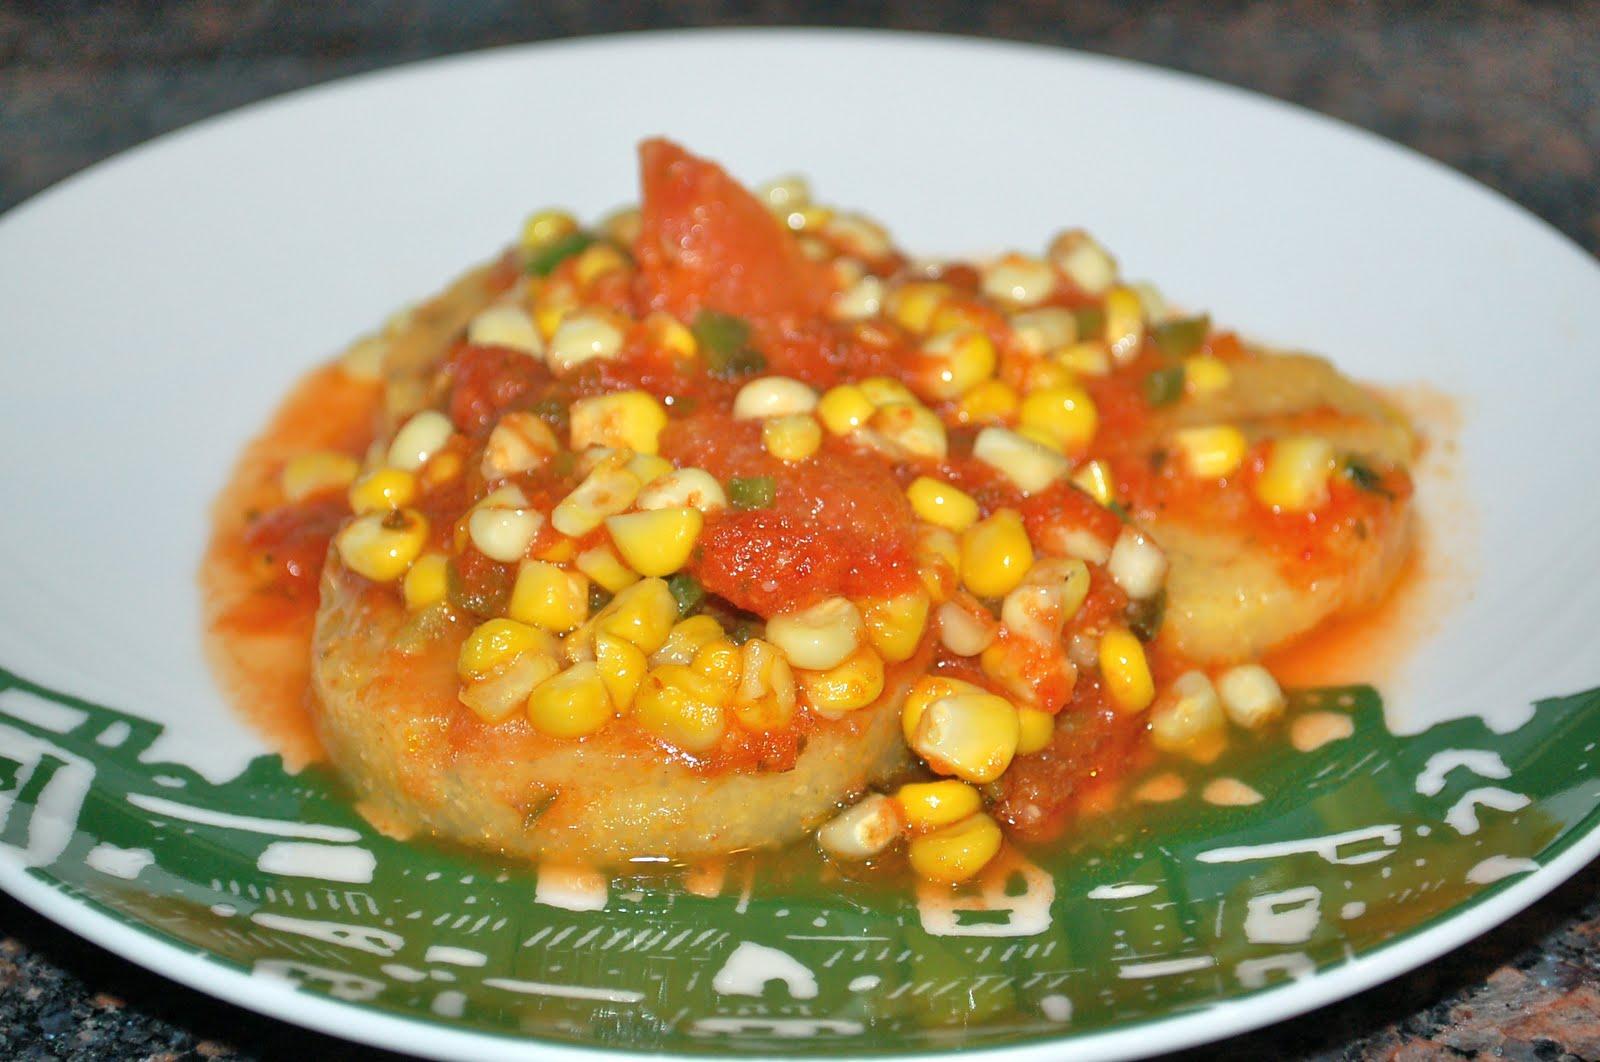 Sofull Sista: Polenta Baked with Corn, Tomato & Basil